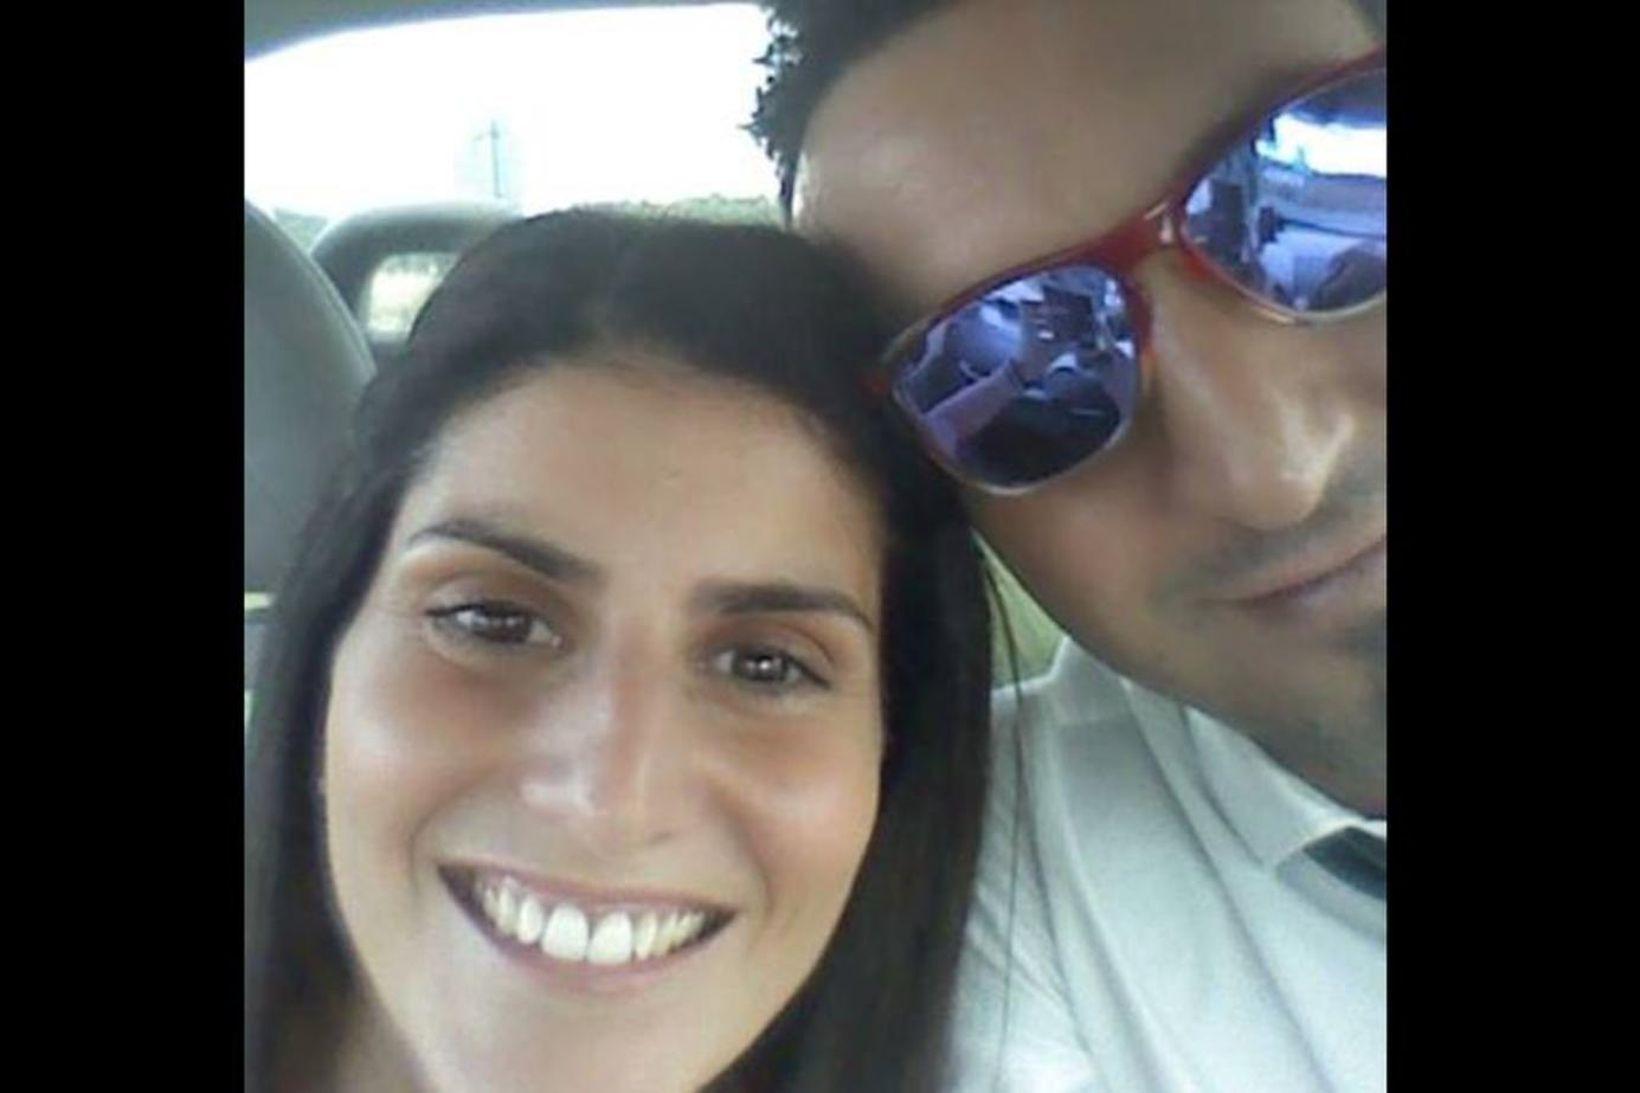 Cristina Rosi og Gabriele Succi.